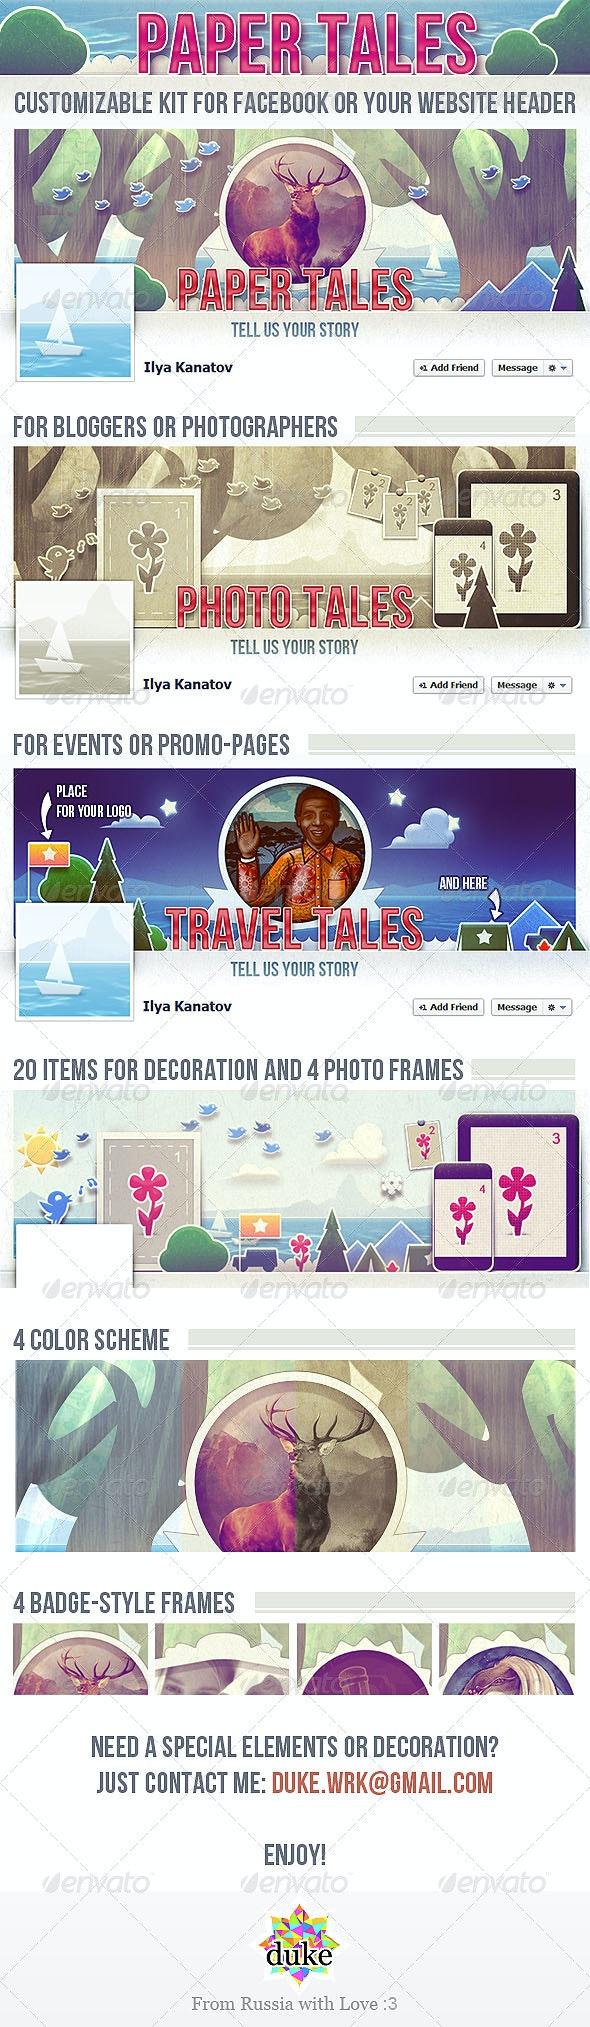 Paper Tales FB Timeline Cover - Facebook Timeline Covers Social Media